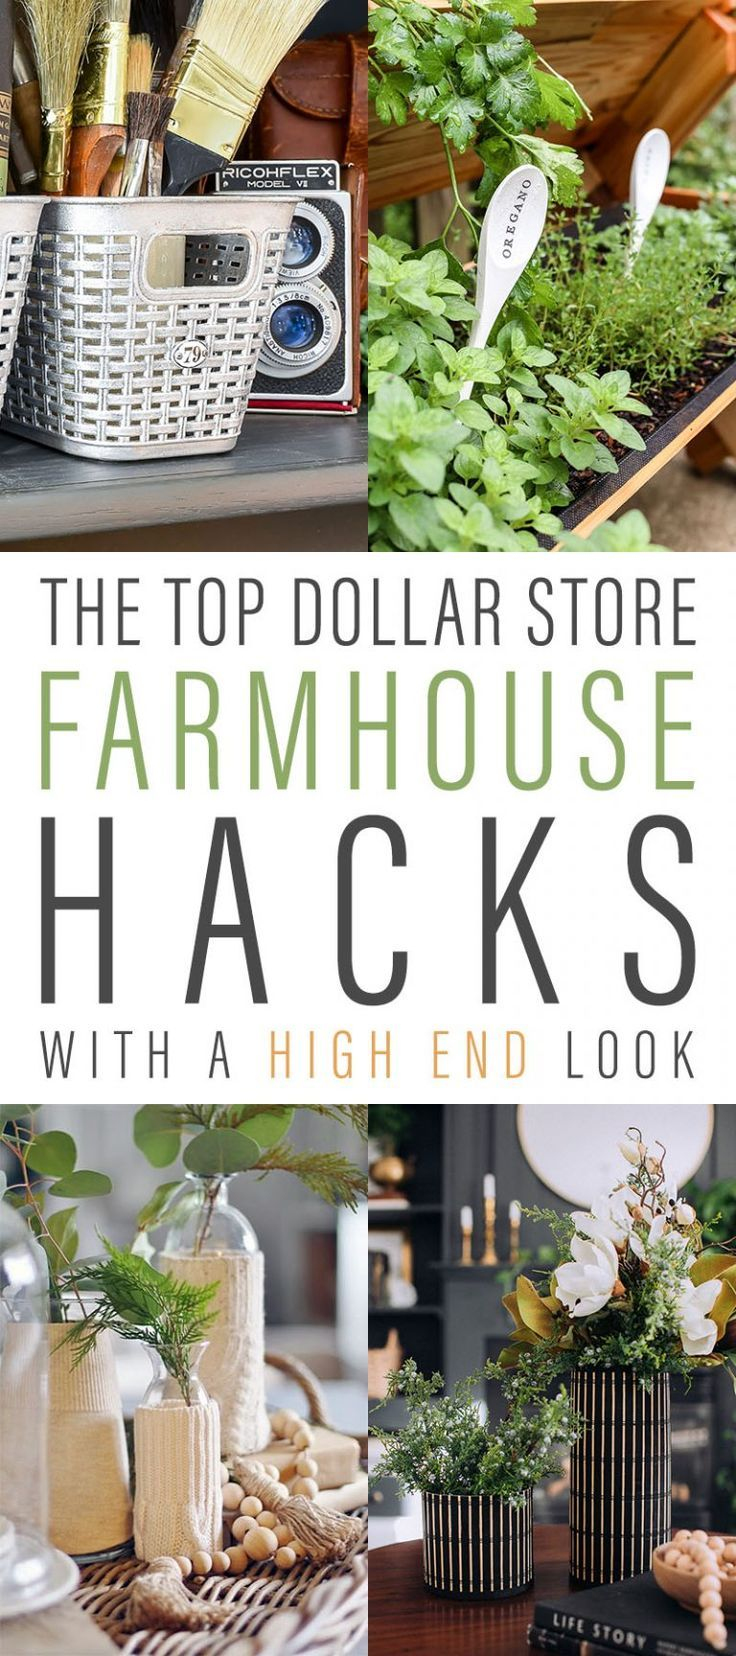 The Top Farmhouse Dollar Store Hacks With a High E…